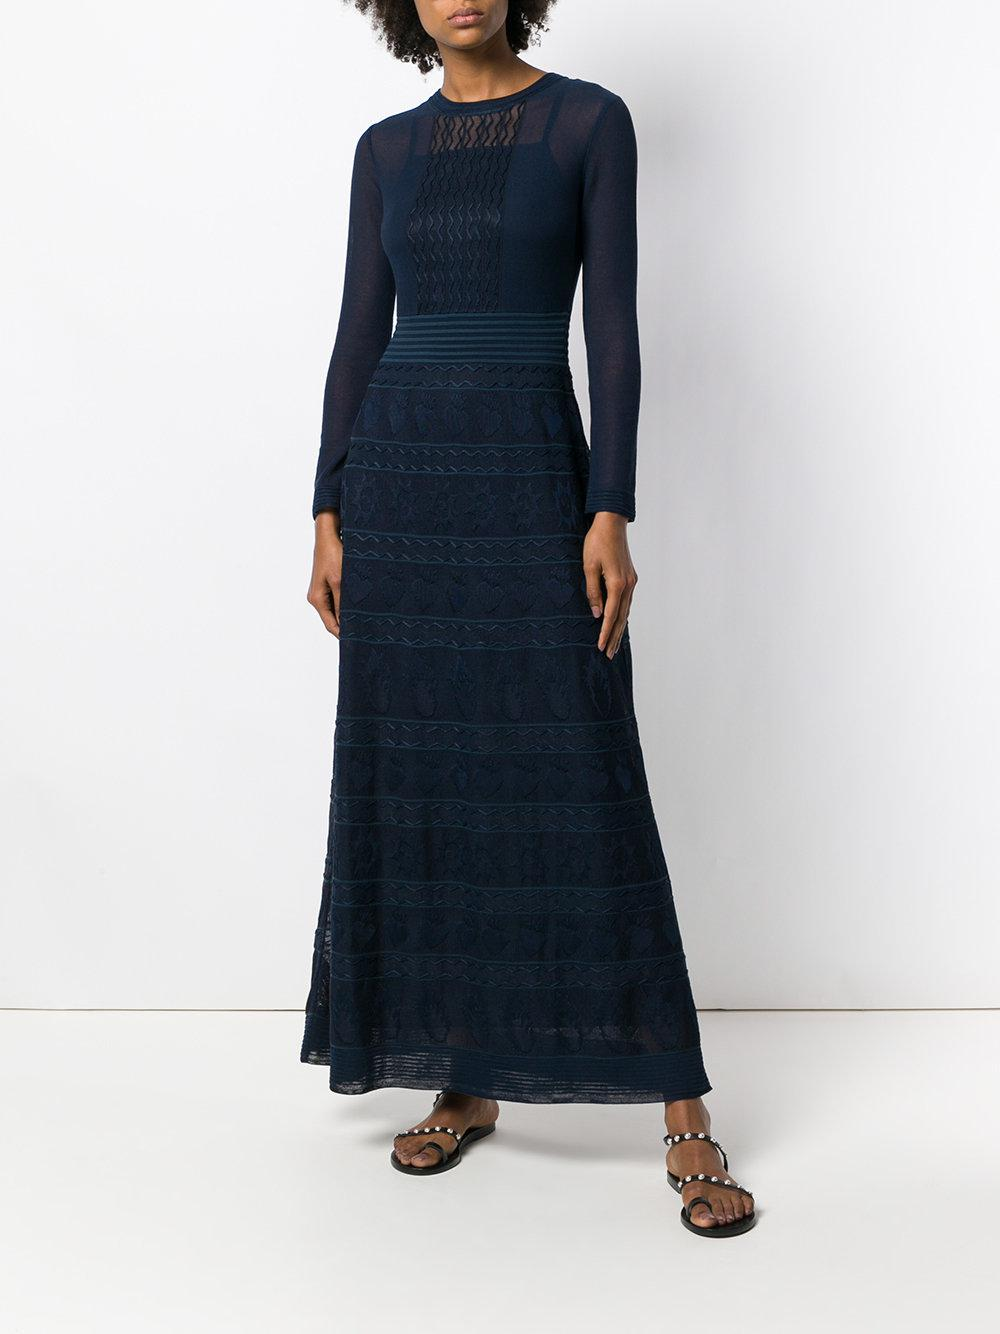 long fantasy dress - Blue M Missoni Cheap With Paypal Clearance 100% Guaranteed 9pJrj